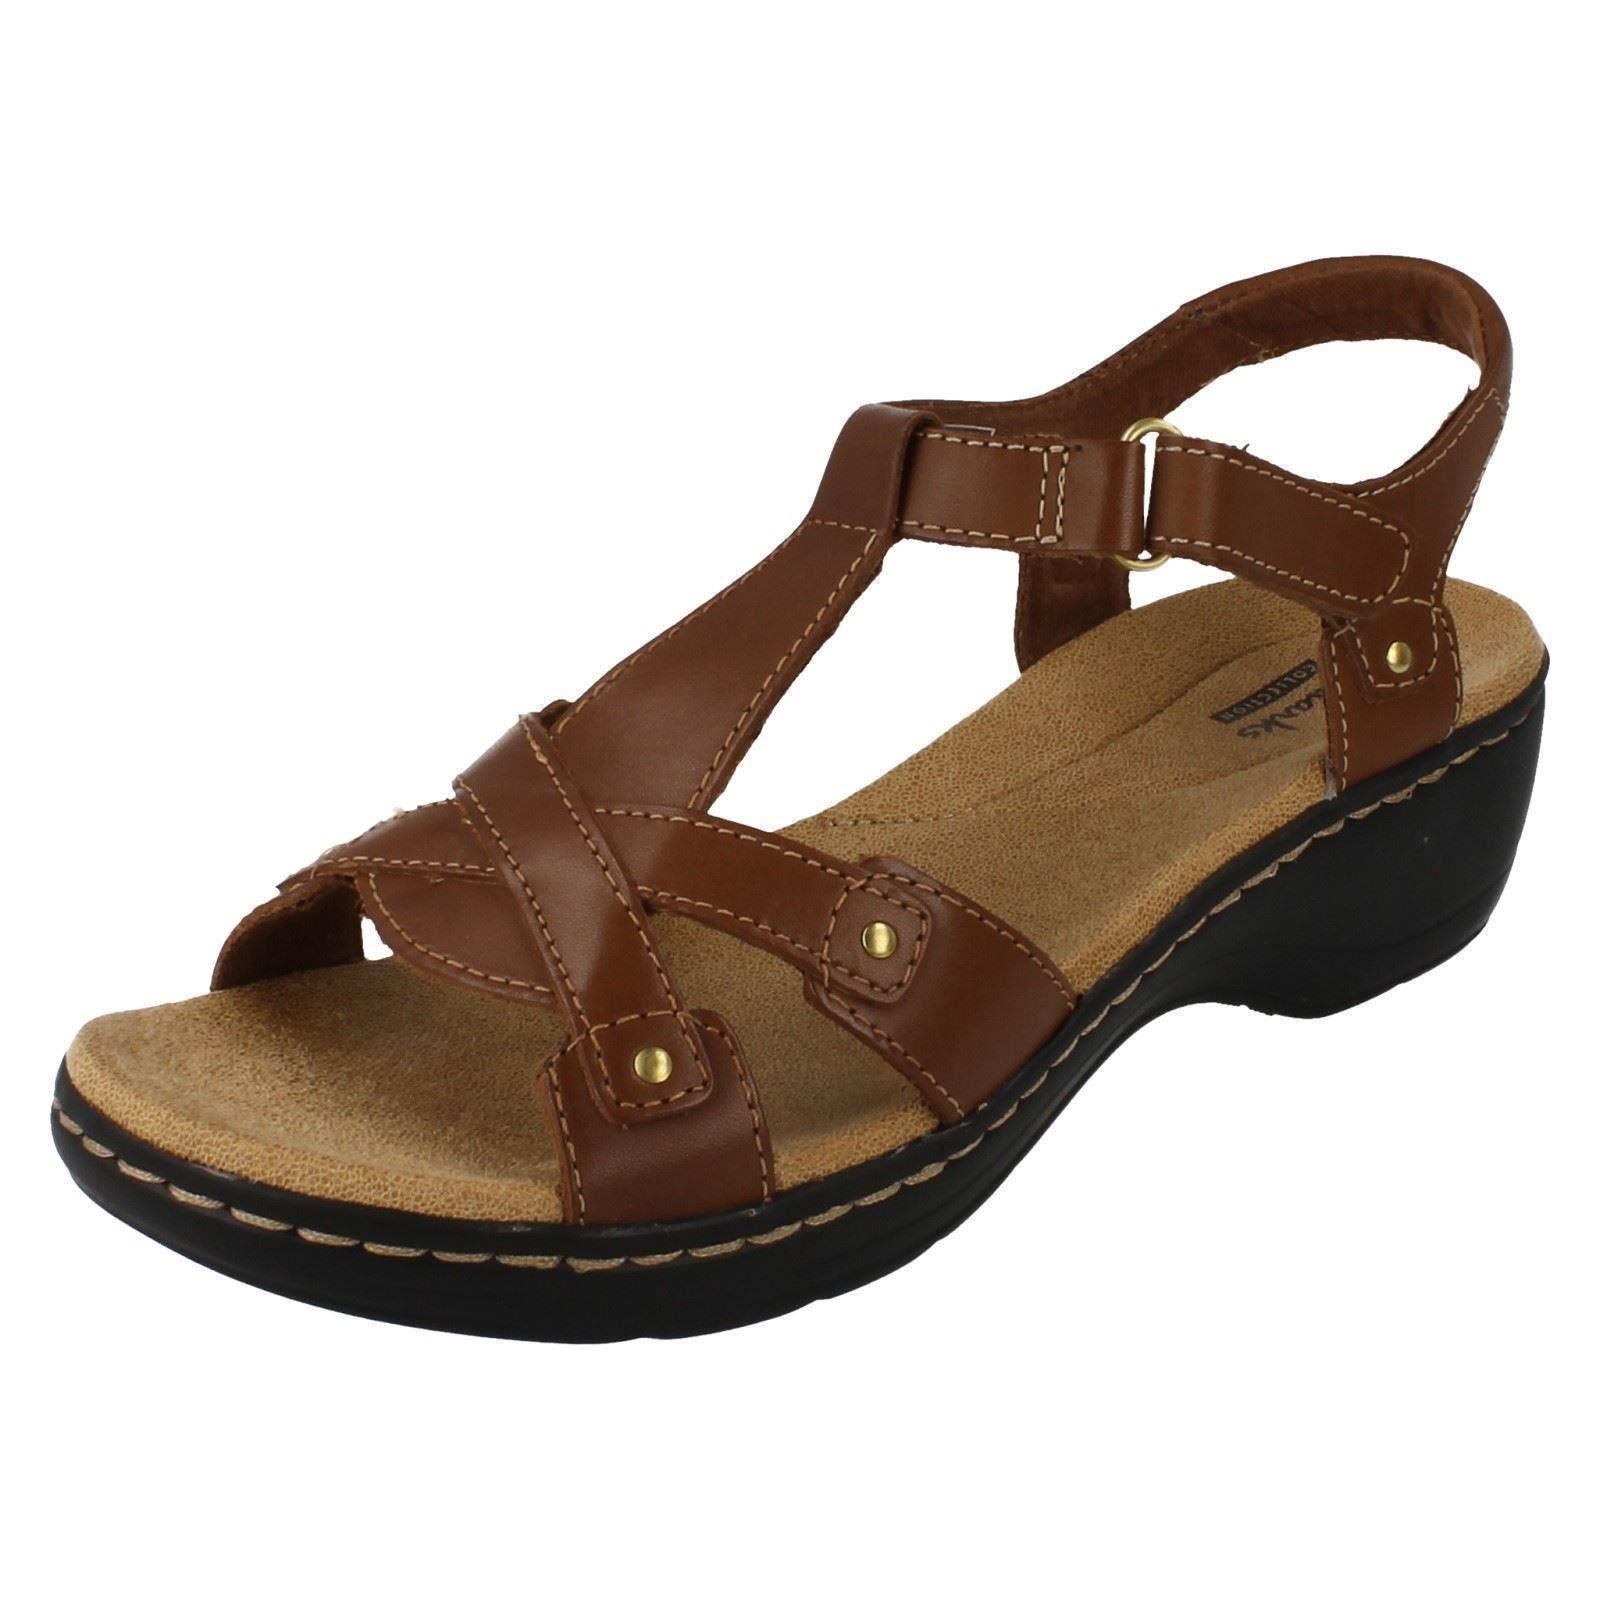 7d9b644d0 Ladies Clarks Leather Wedge Open Toe Summer Sandals Hayla Flute 3 UK ...